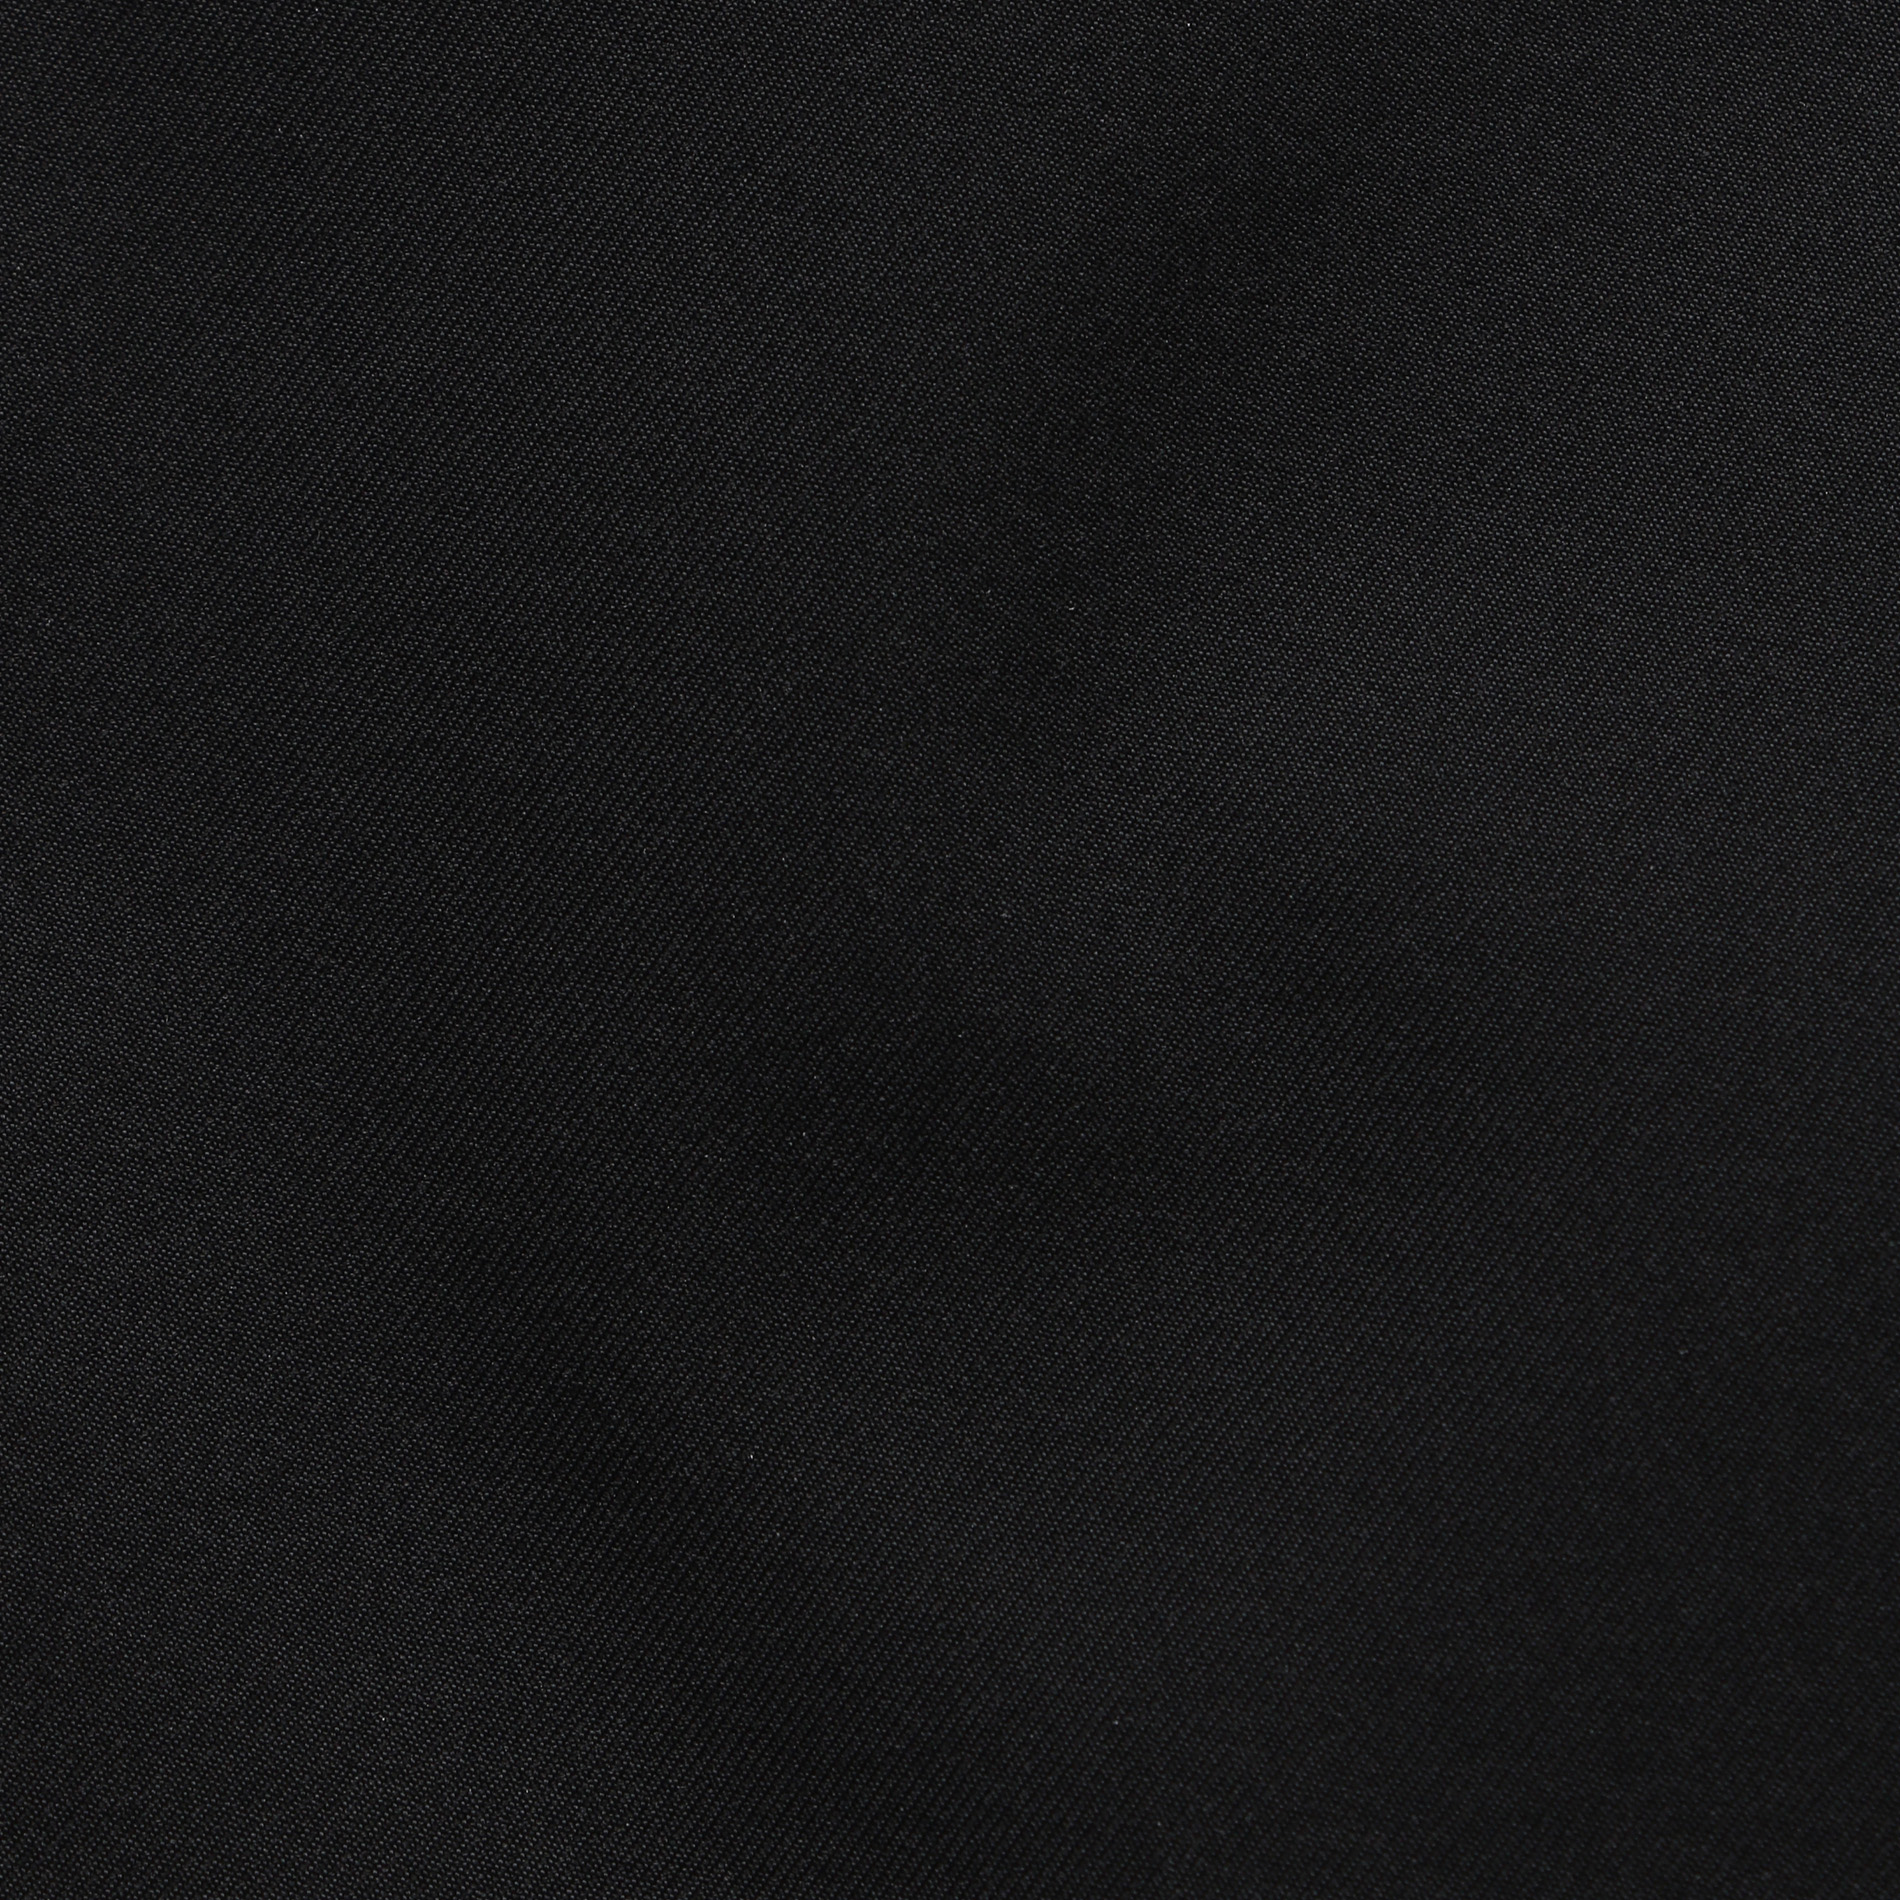 【DUNOON ML】高密度ポリエステルコート